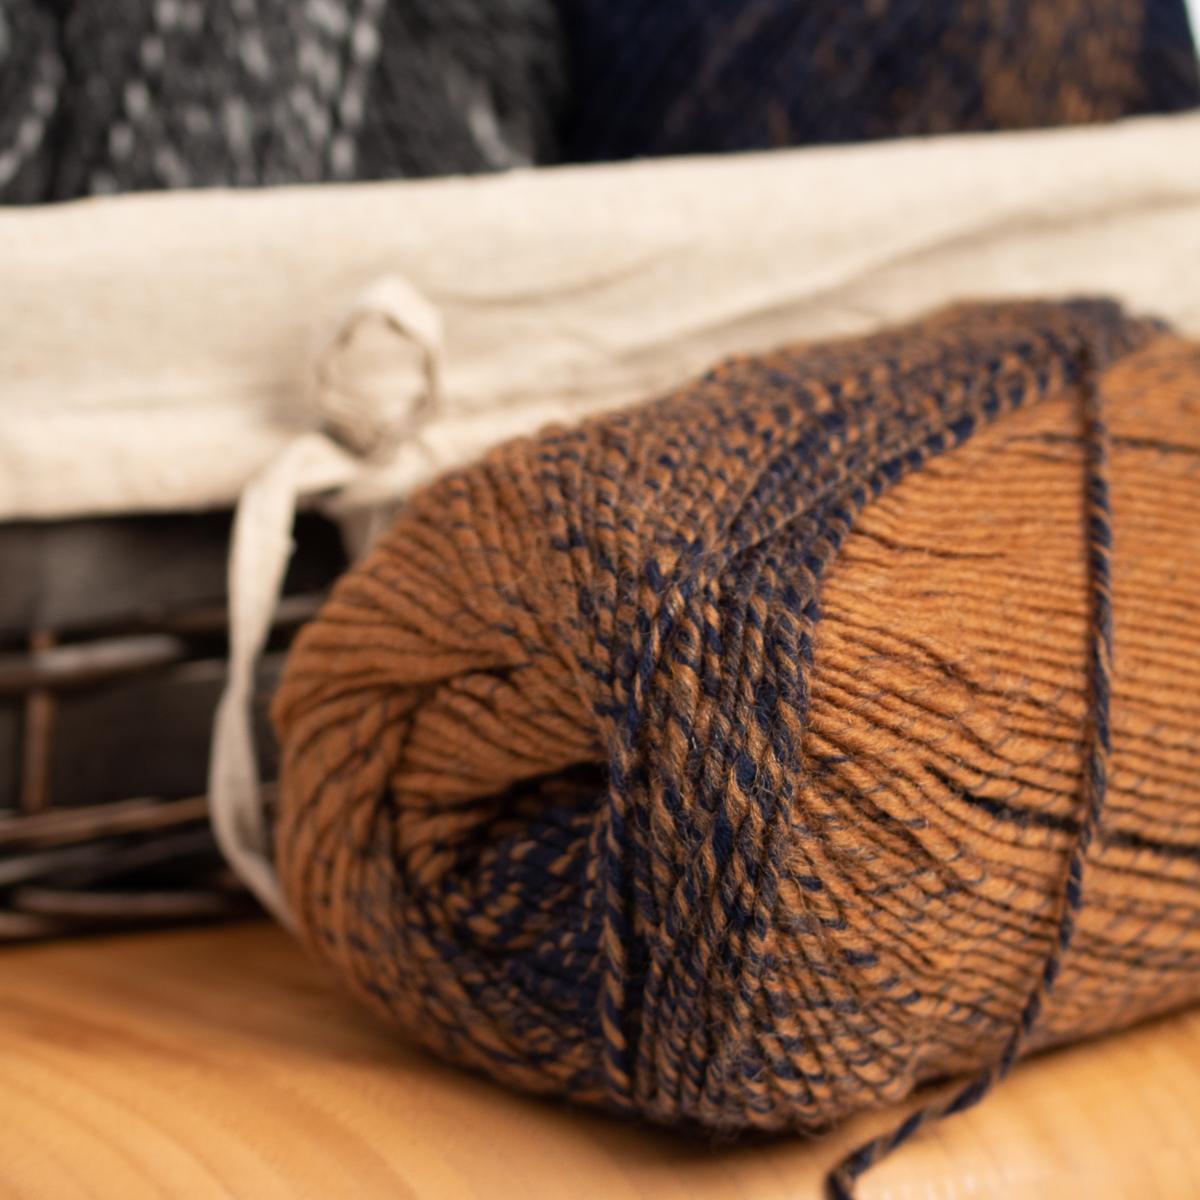 3pk-Lion-Brand-Scarfie-Acrylic-amp-Wool-Yarn-Bulky-5-Knitting-Crochet-Skeins-Soft thumbnail 7